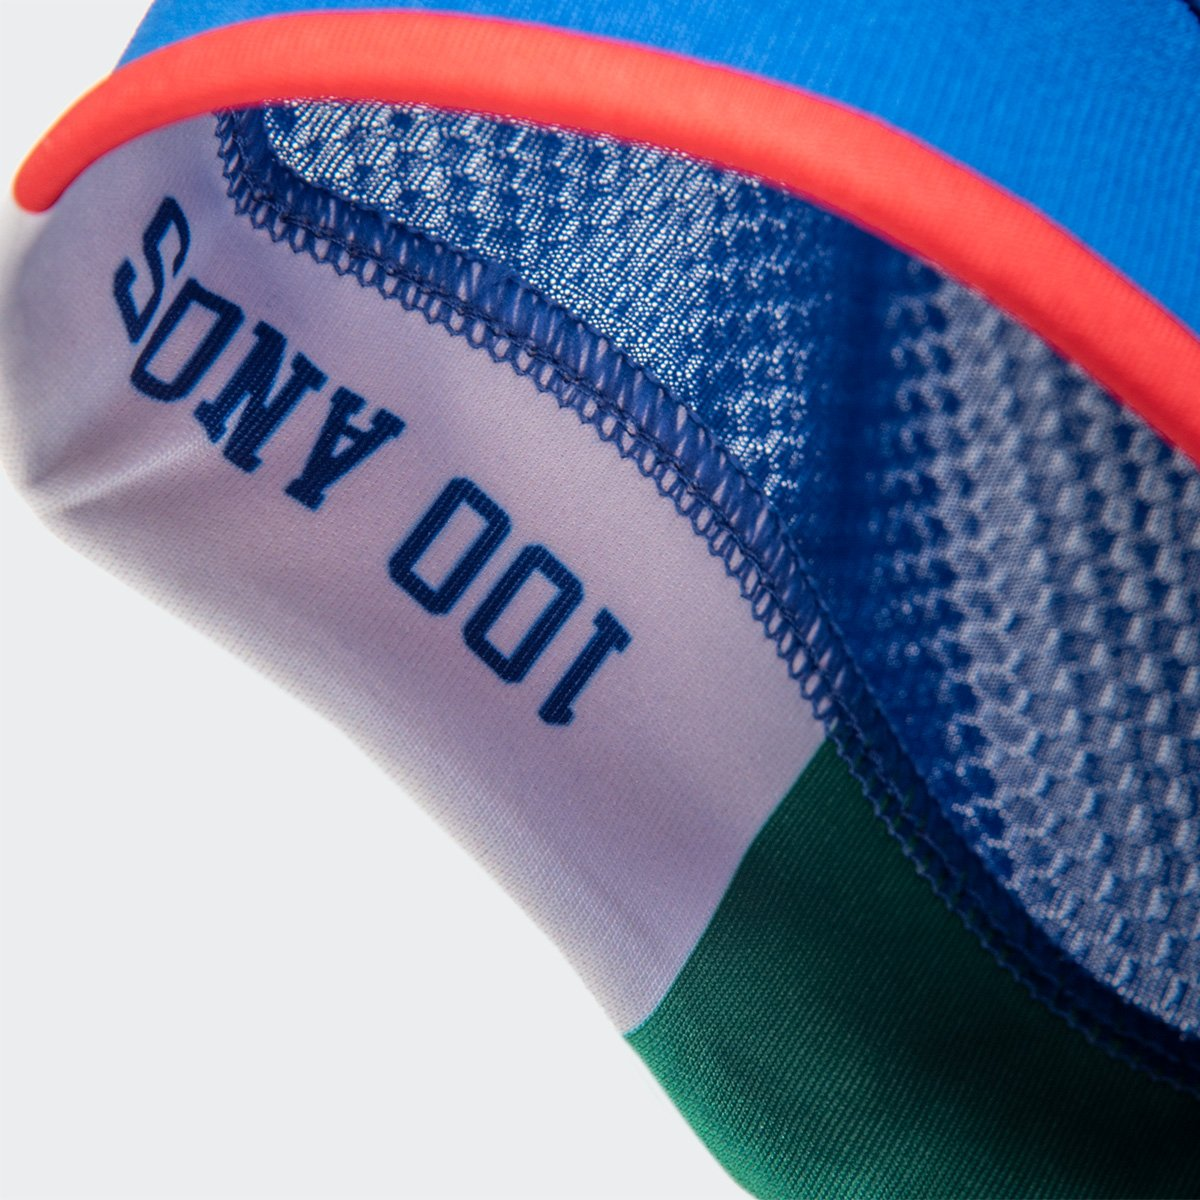 Camisa Cruzeiro I 21/22 s/n° Torcedor Adidas